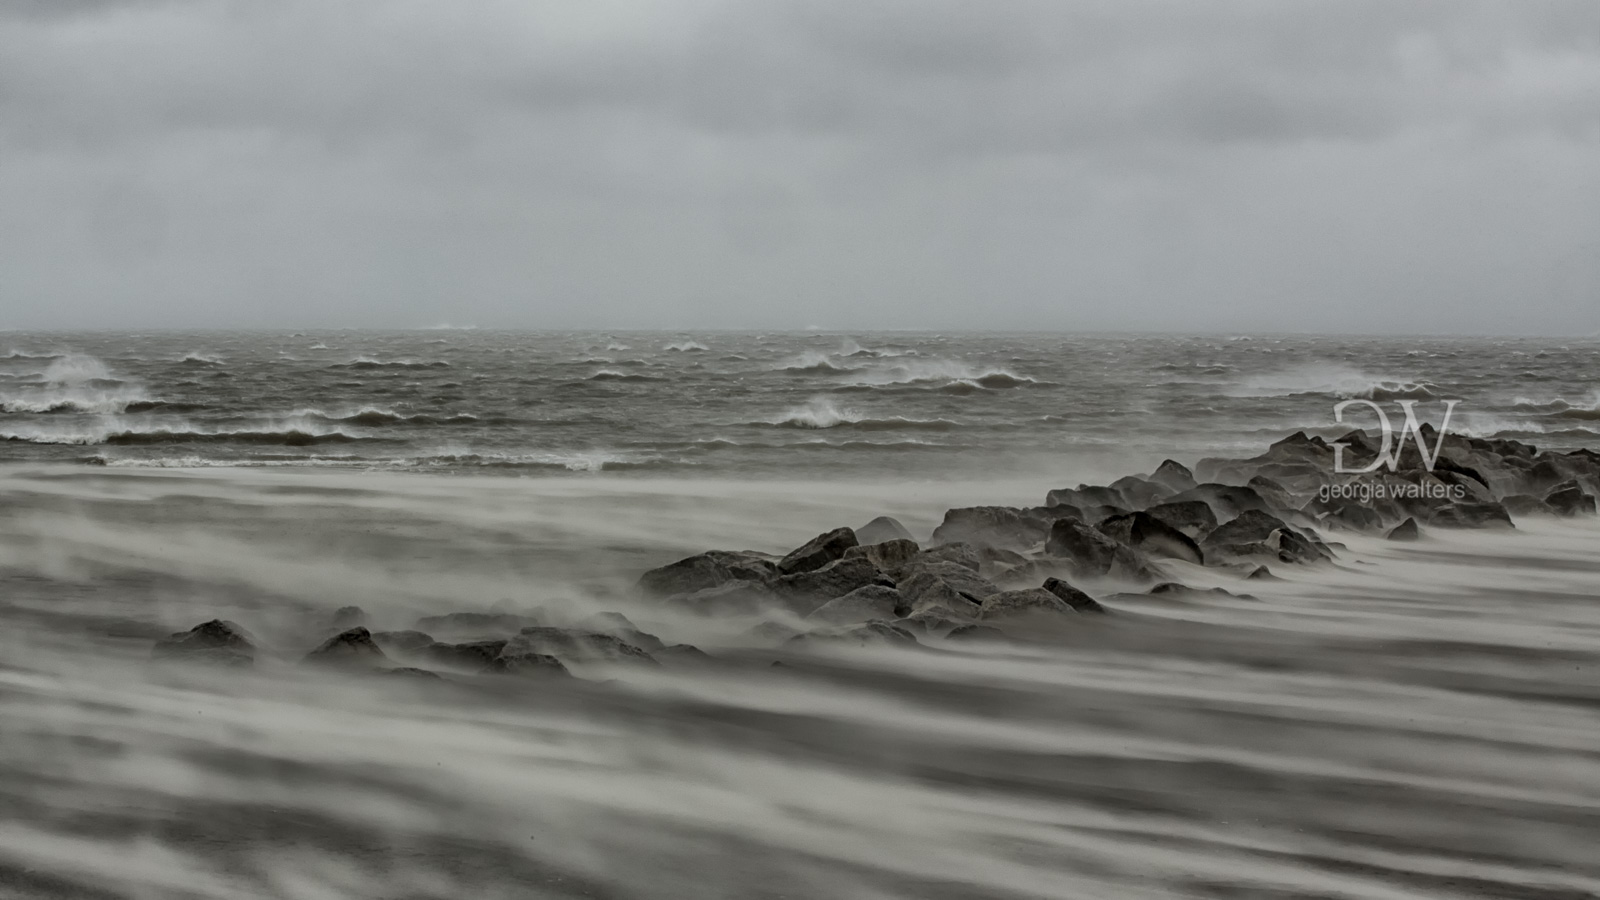 Blowing sand during Hurricane Matthew on Tybee Island, GA.